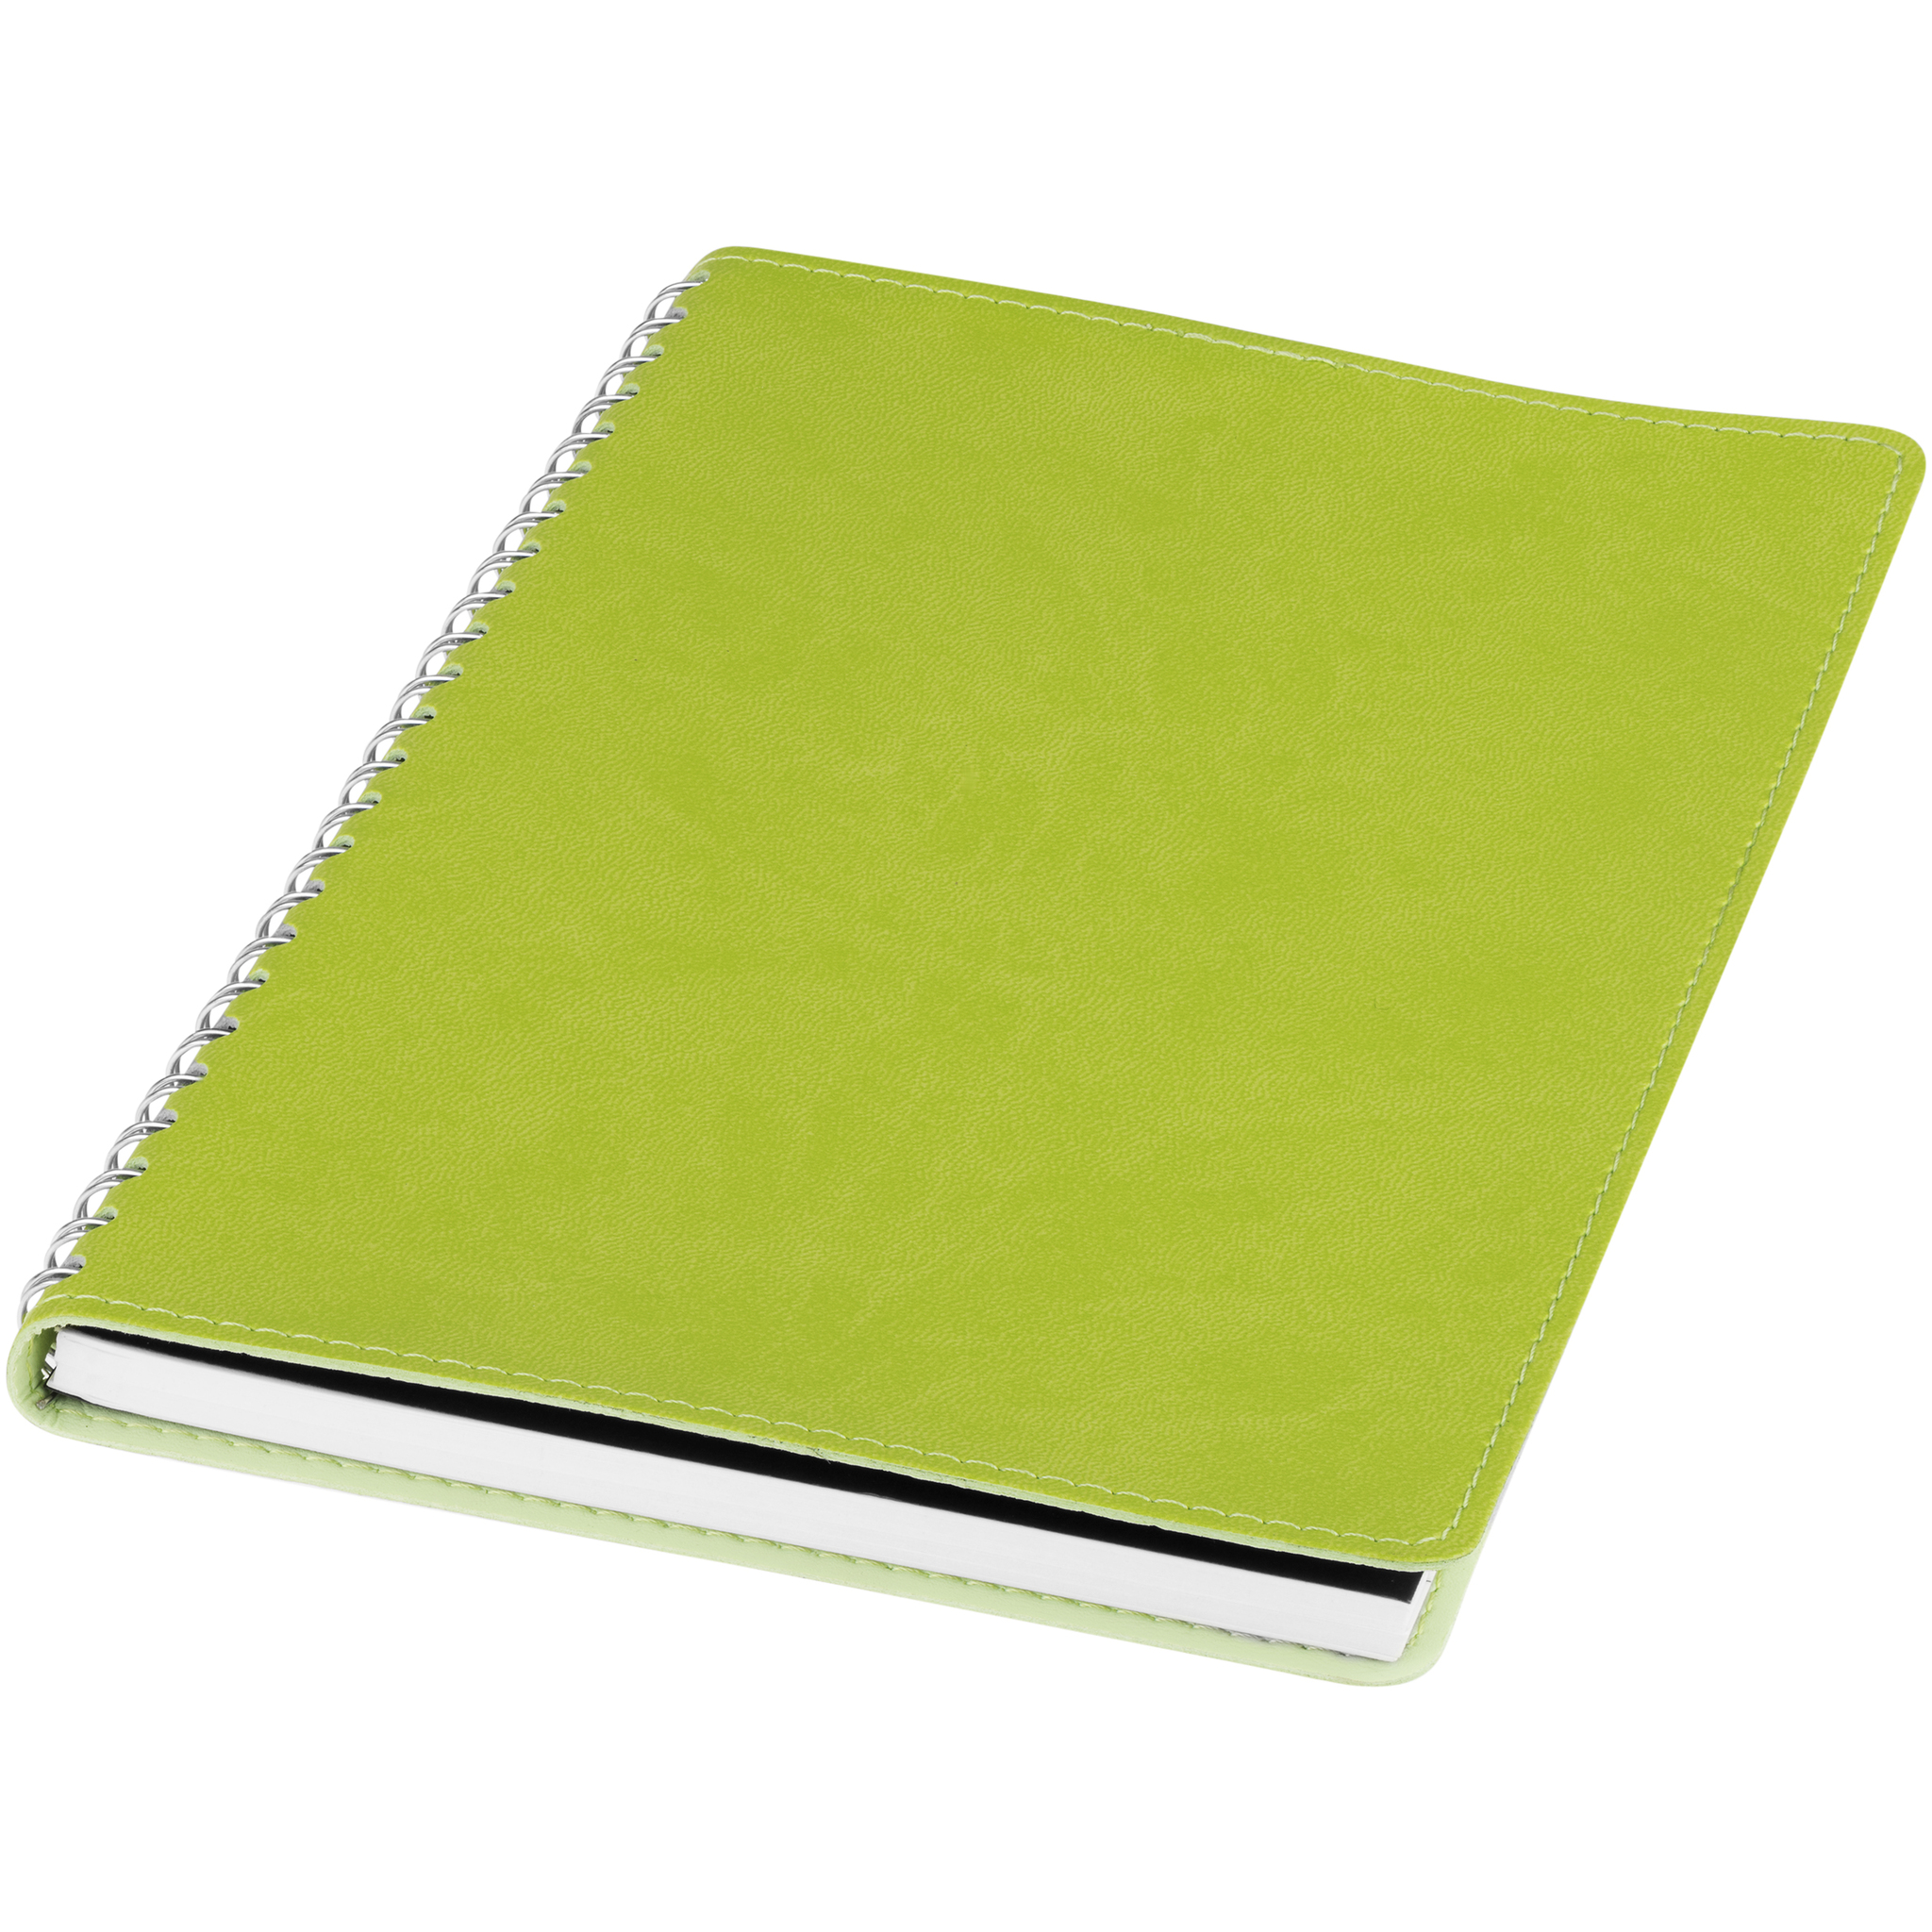 Bullet-Brinc-A5-Notebook-PF708